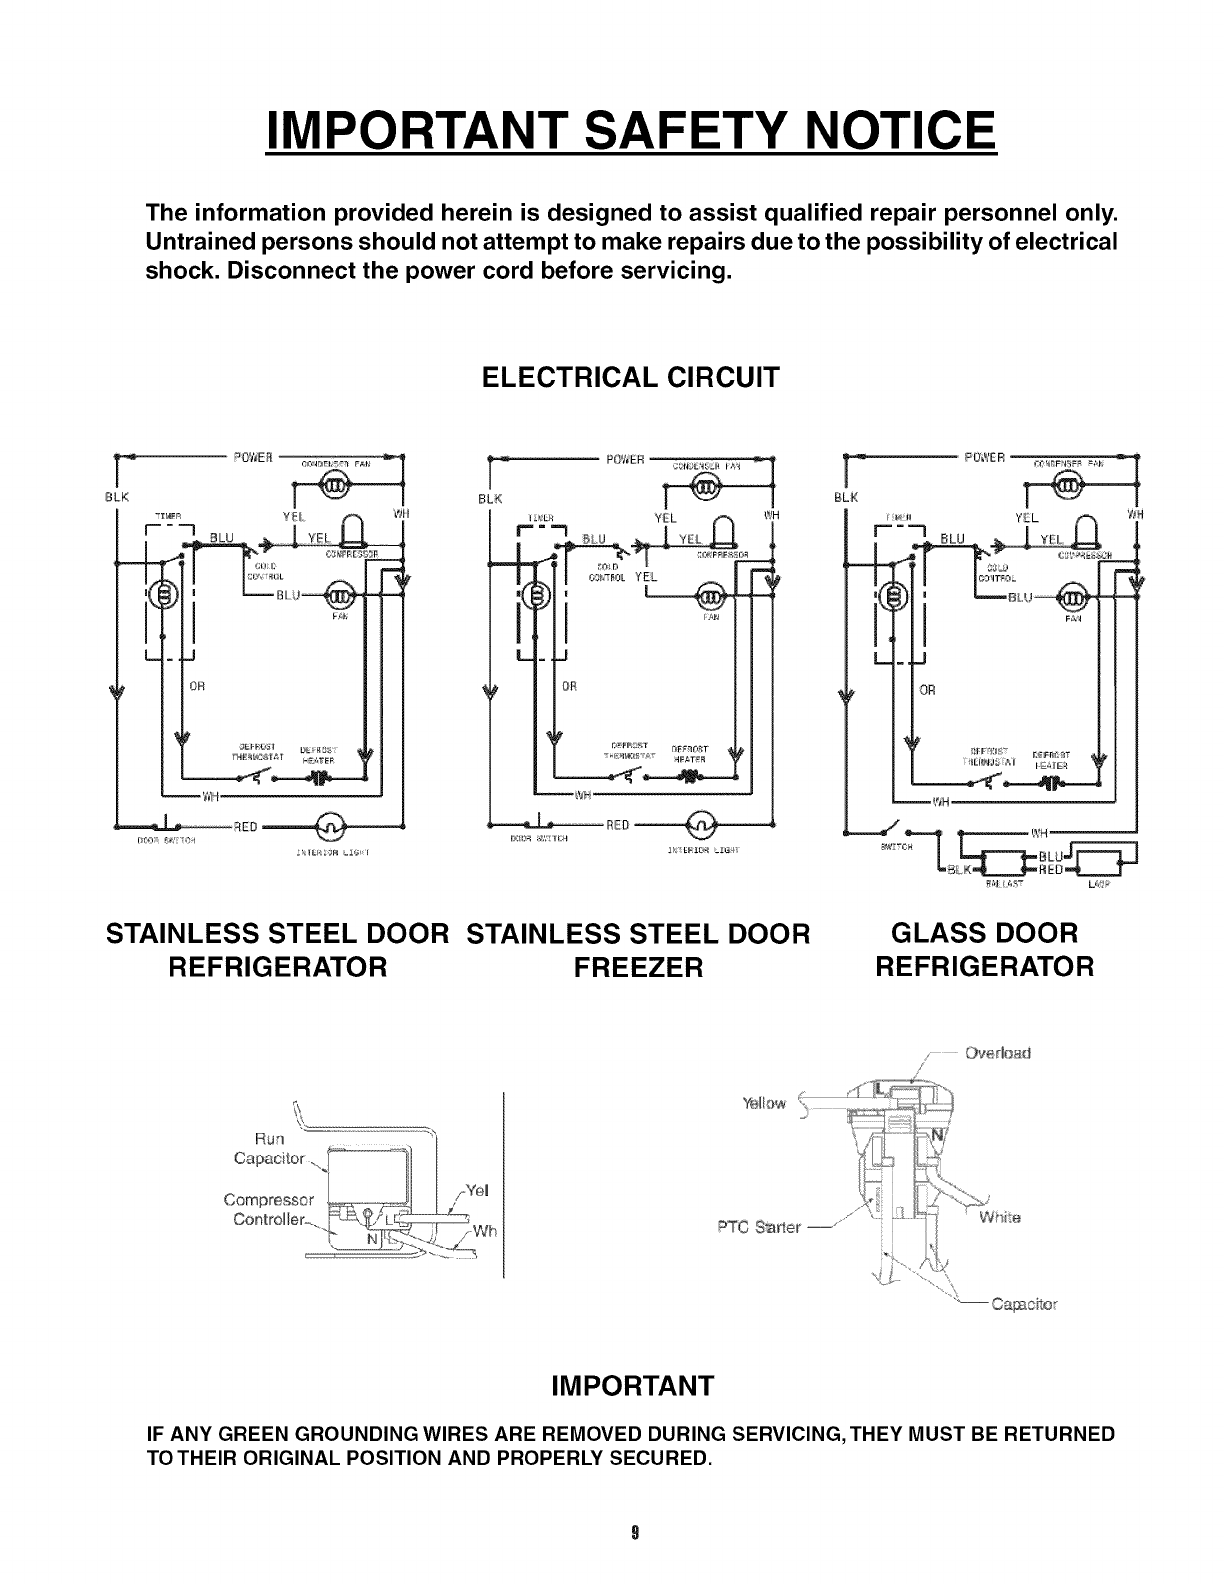 Kelvinator KFS220RHY1 User Manual FREEZER Manuals And Guides ... on traulsen refrigerator wiring diagrams, kenmore refrigerator wiring diagrams, ge refrigerator wiring diagrams, frigidaire refrigerator wiring diagrams, general electric refrigerator wiring diagrams, amana refrigerator wiring diagrams, haier refrigerator wiring diagrams, kitchenaid refrigerator wiring diagrams, whirlpool refrigerator wiring diagrams, electrolux refrigerator wiring diagrams,